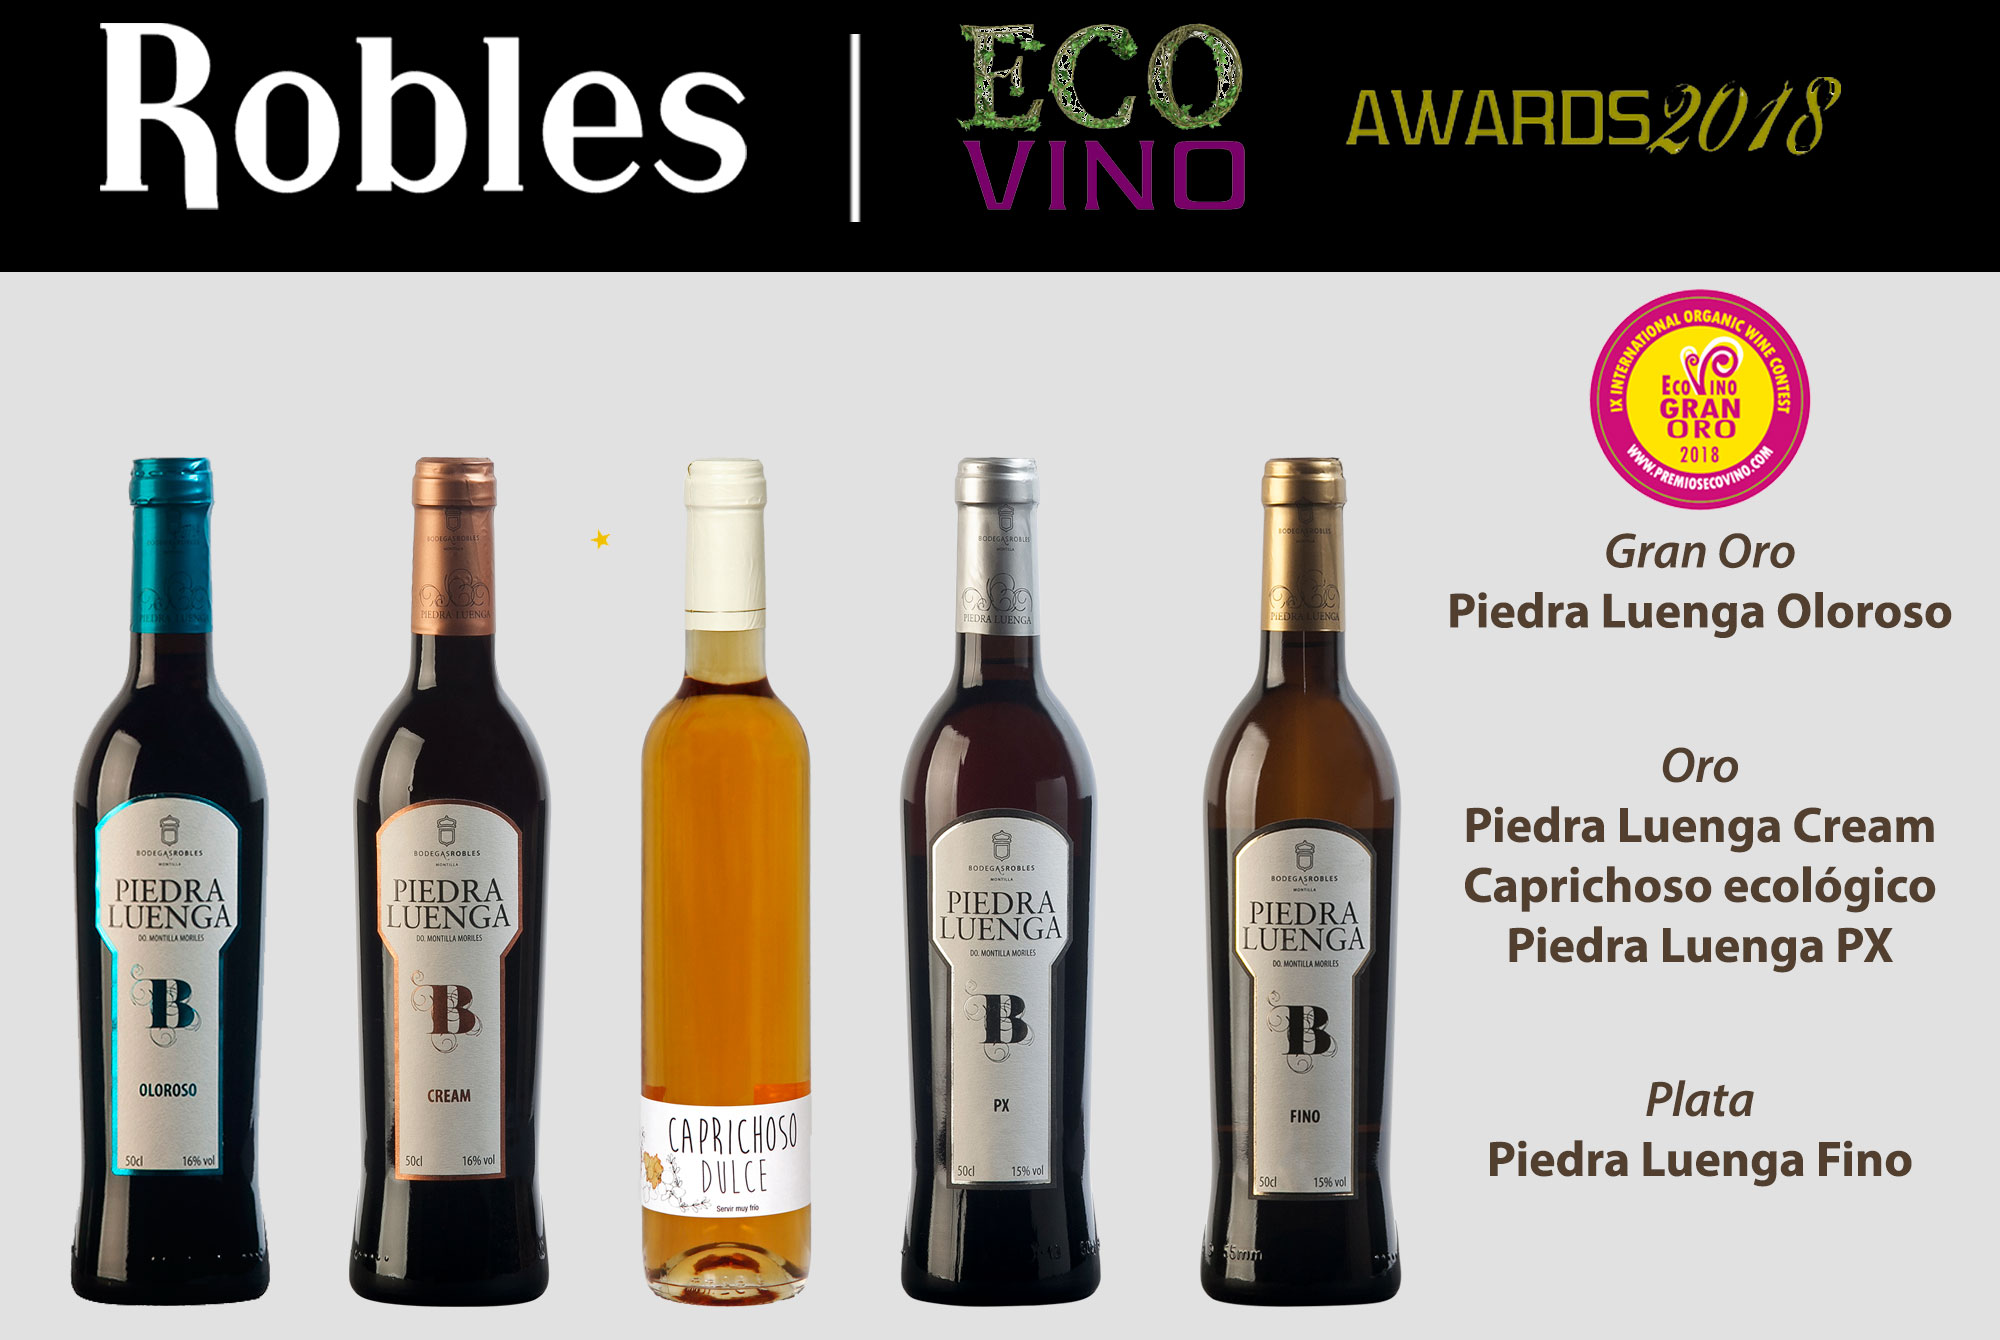 Bodegas Robles, best score Ecovino 2018 (Rioja) with organic Oloroso wine